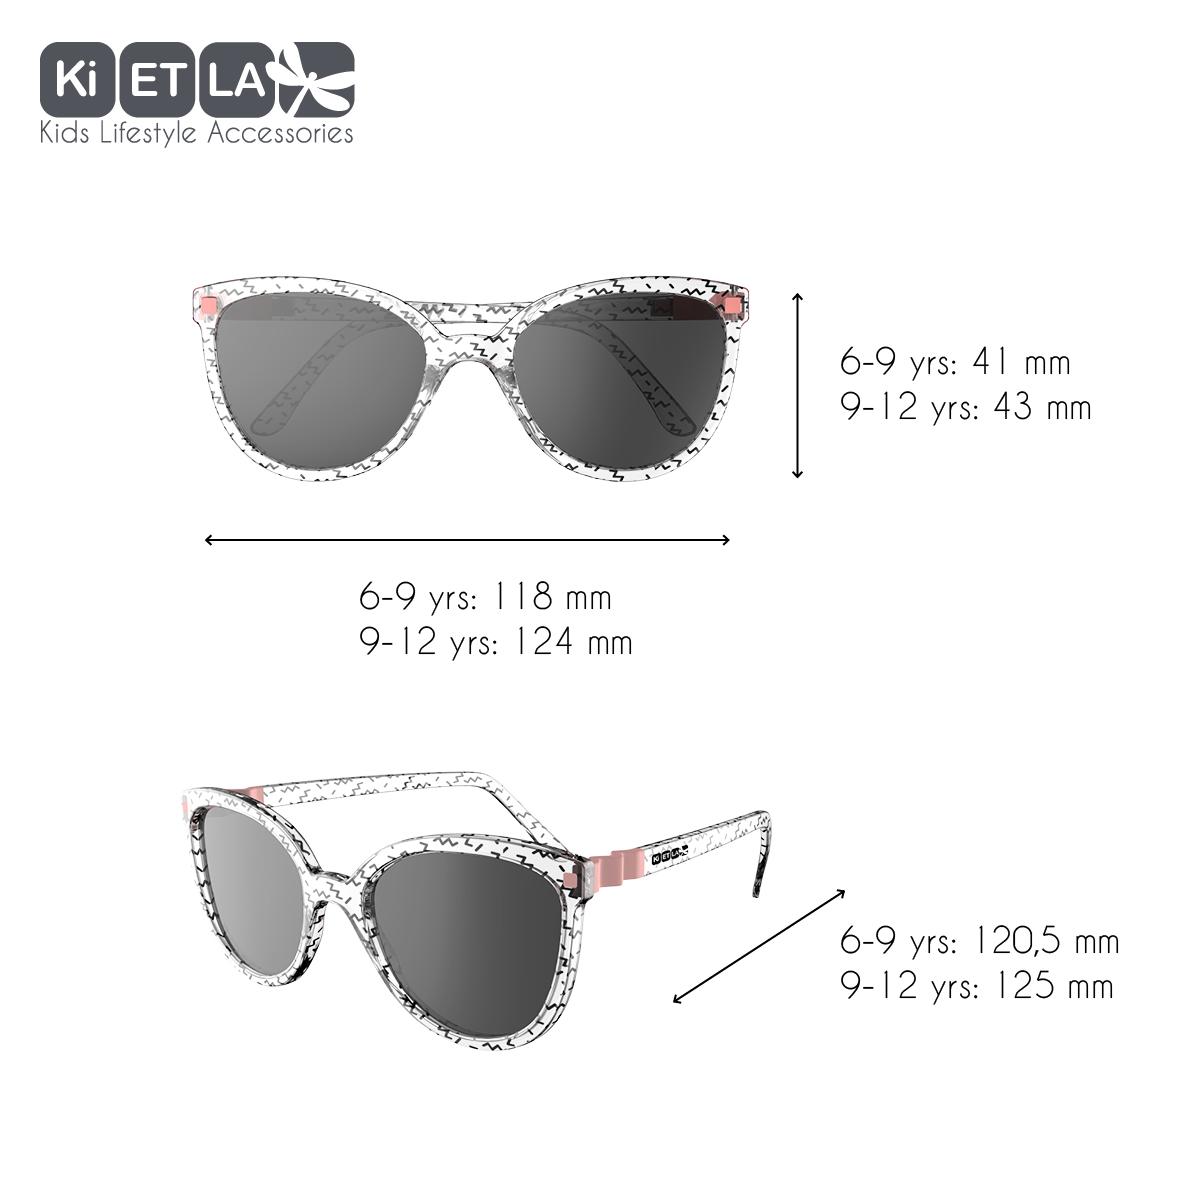 7cc17277cd Αξεσουαρ    Γυαλιά Ηλίου Kietla    6-9 ετών ΚiETLA γυαλιά ηλίου ...